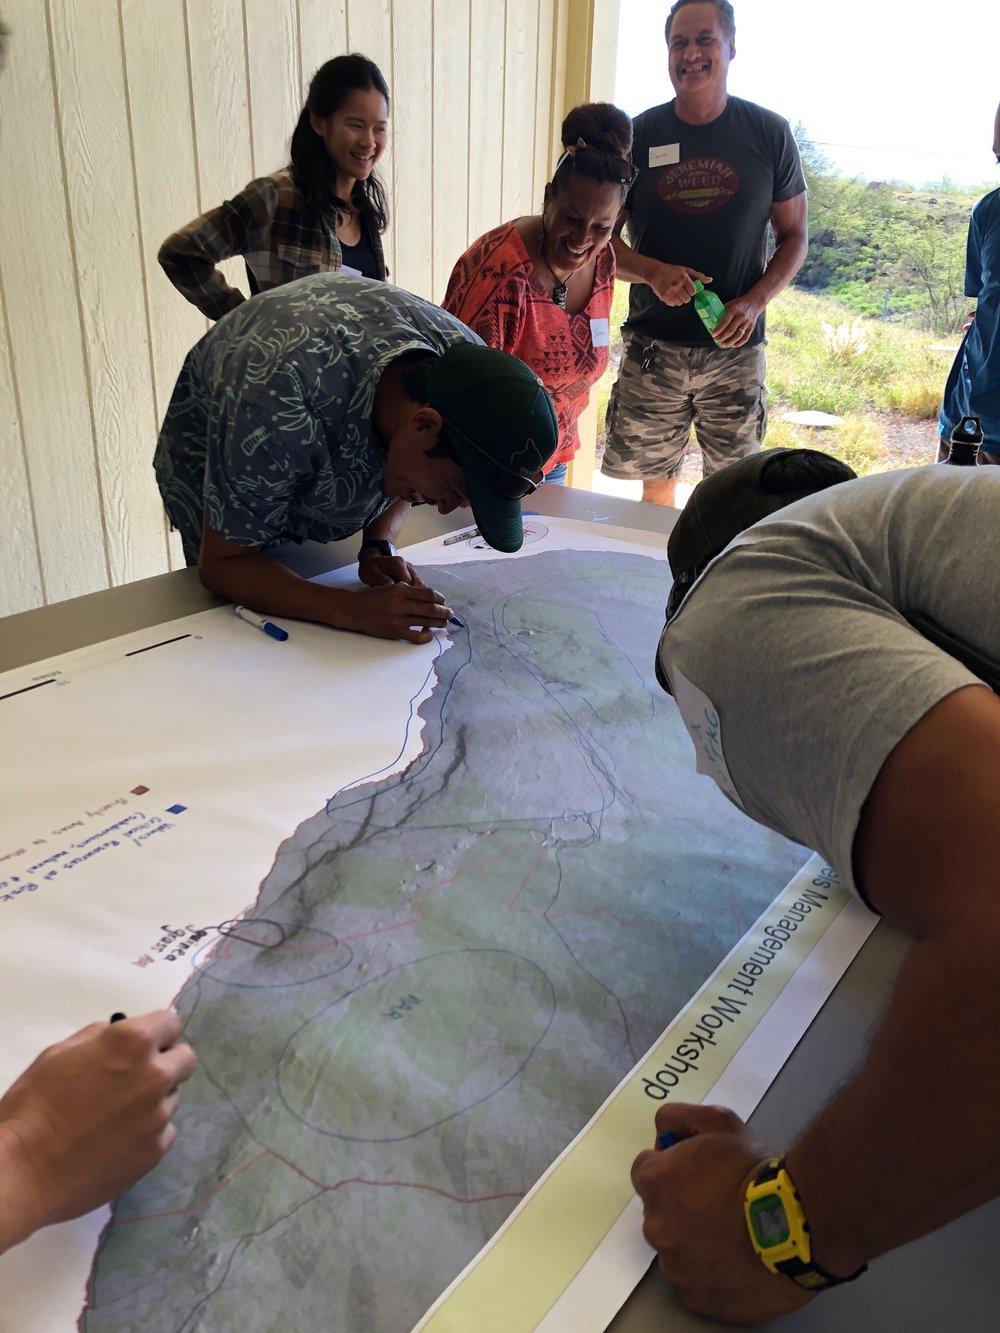 Hawaii Island Kailapa Vegetative Fuels Management Collaborative Action Planning Workshop_2_26_2019_30.jpg